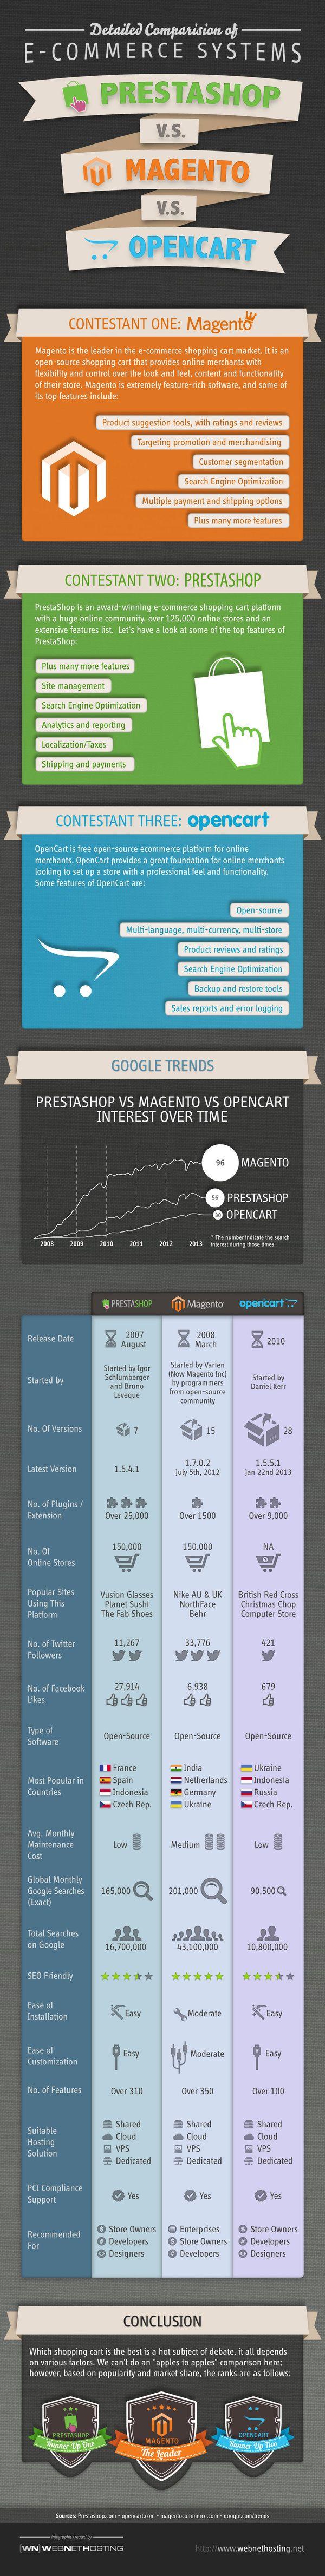 Opencart vs Magento vs Prestashop